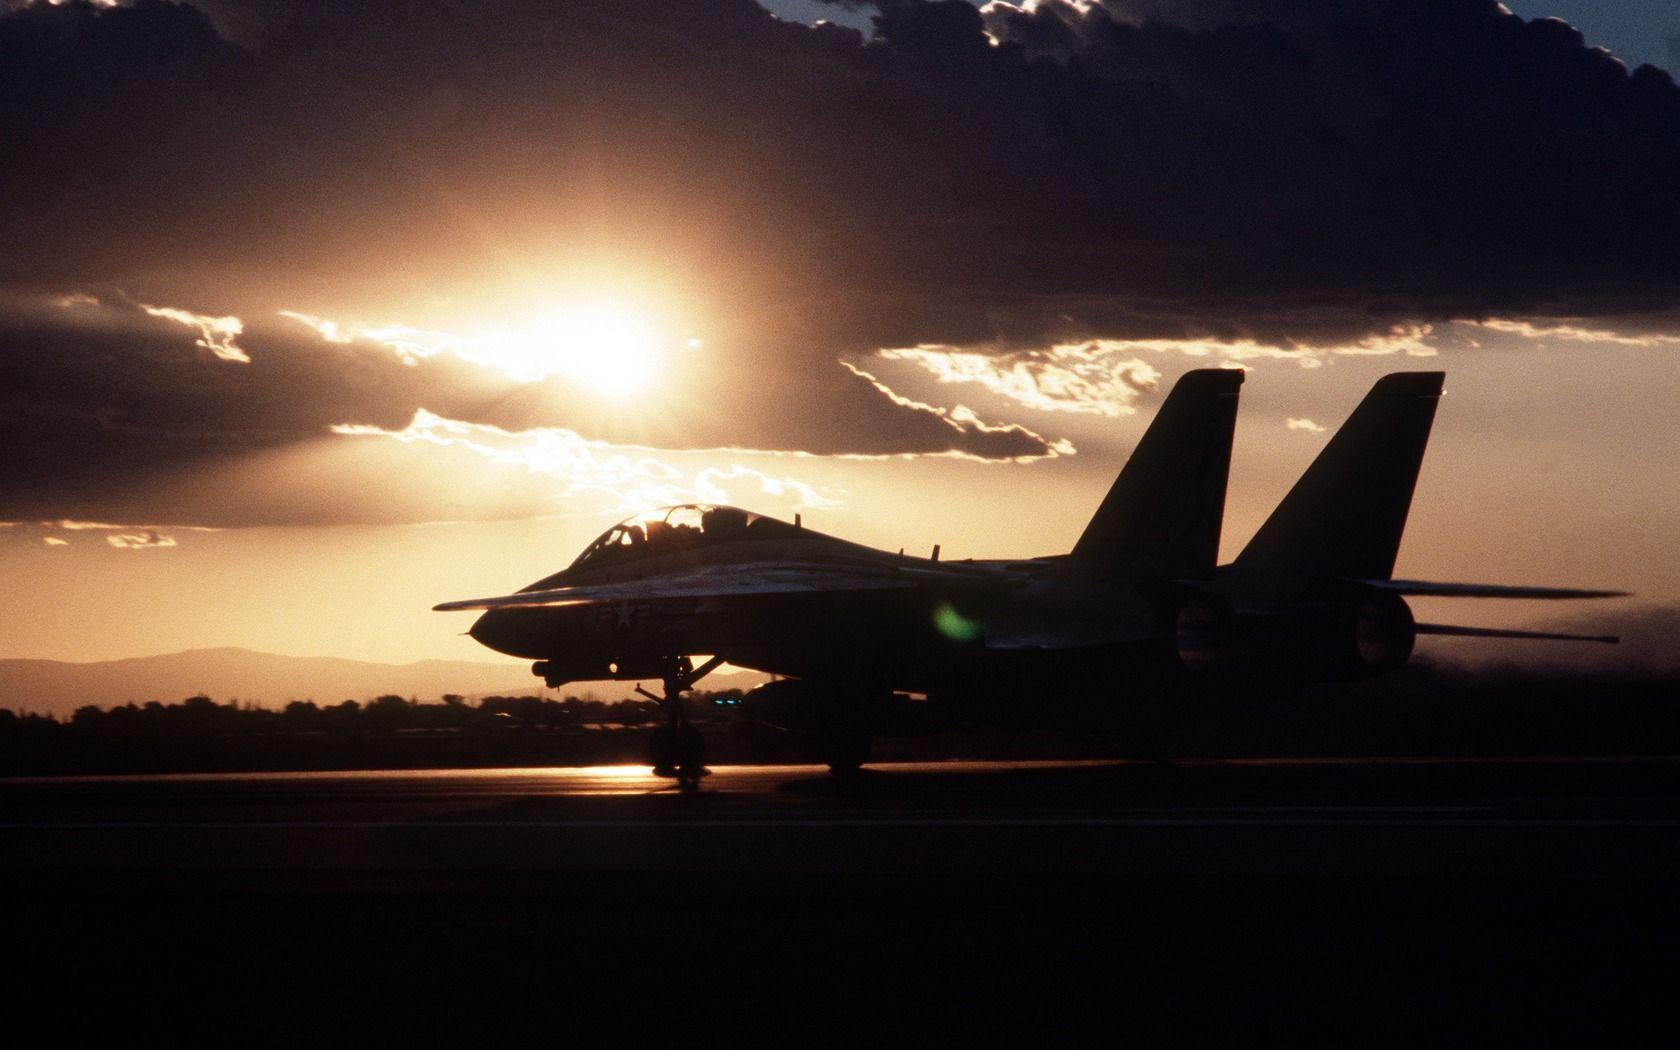 sunset aircraft tomcat landing F 14 Tomcat   Wallpaper 959436 1680x1050